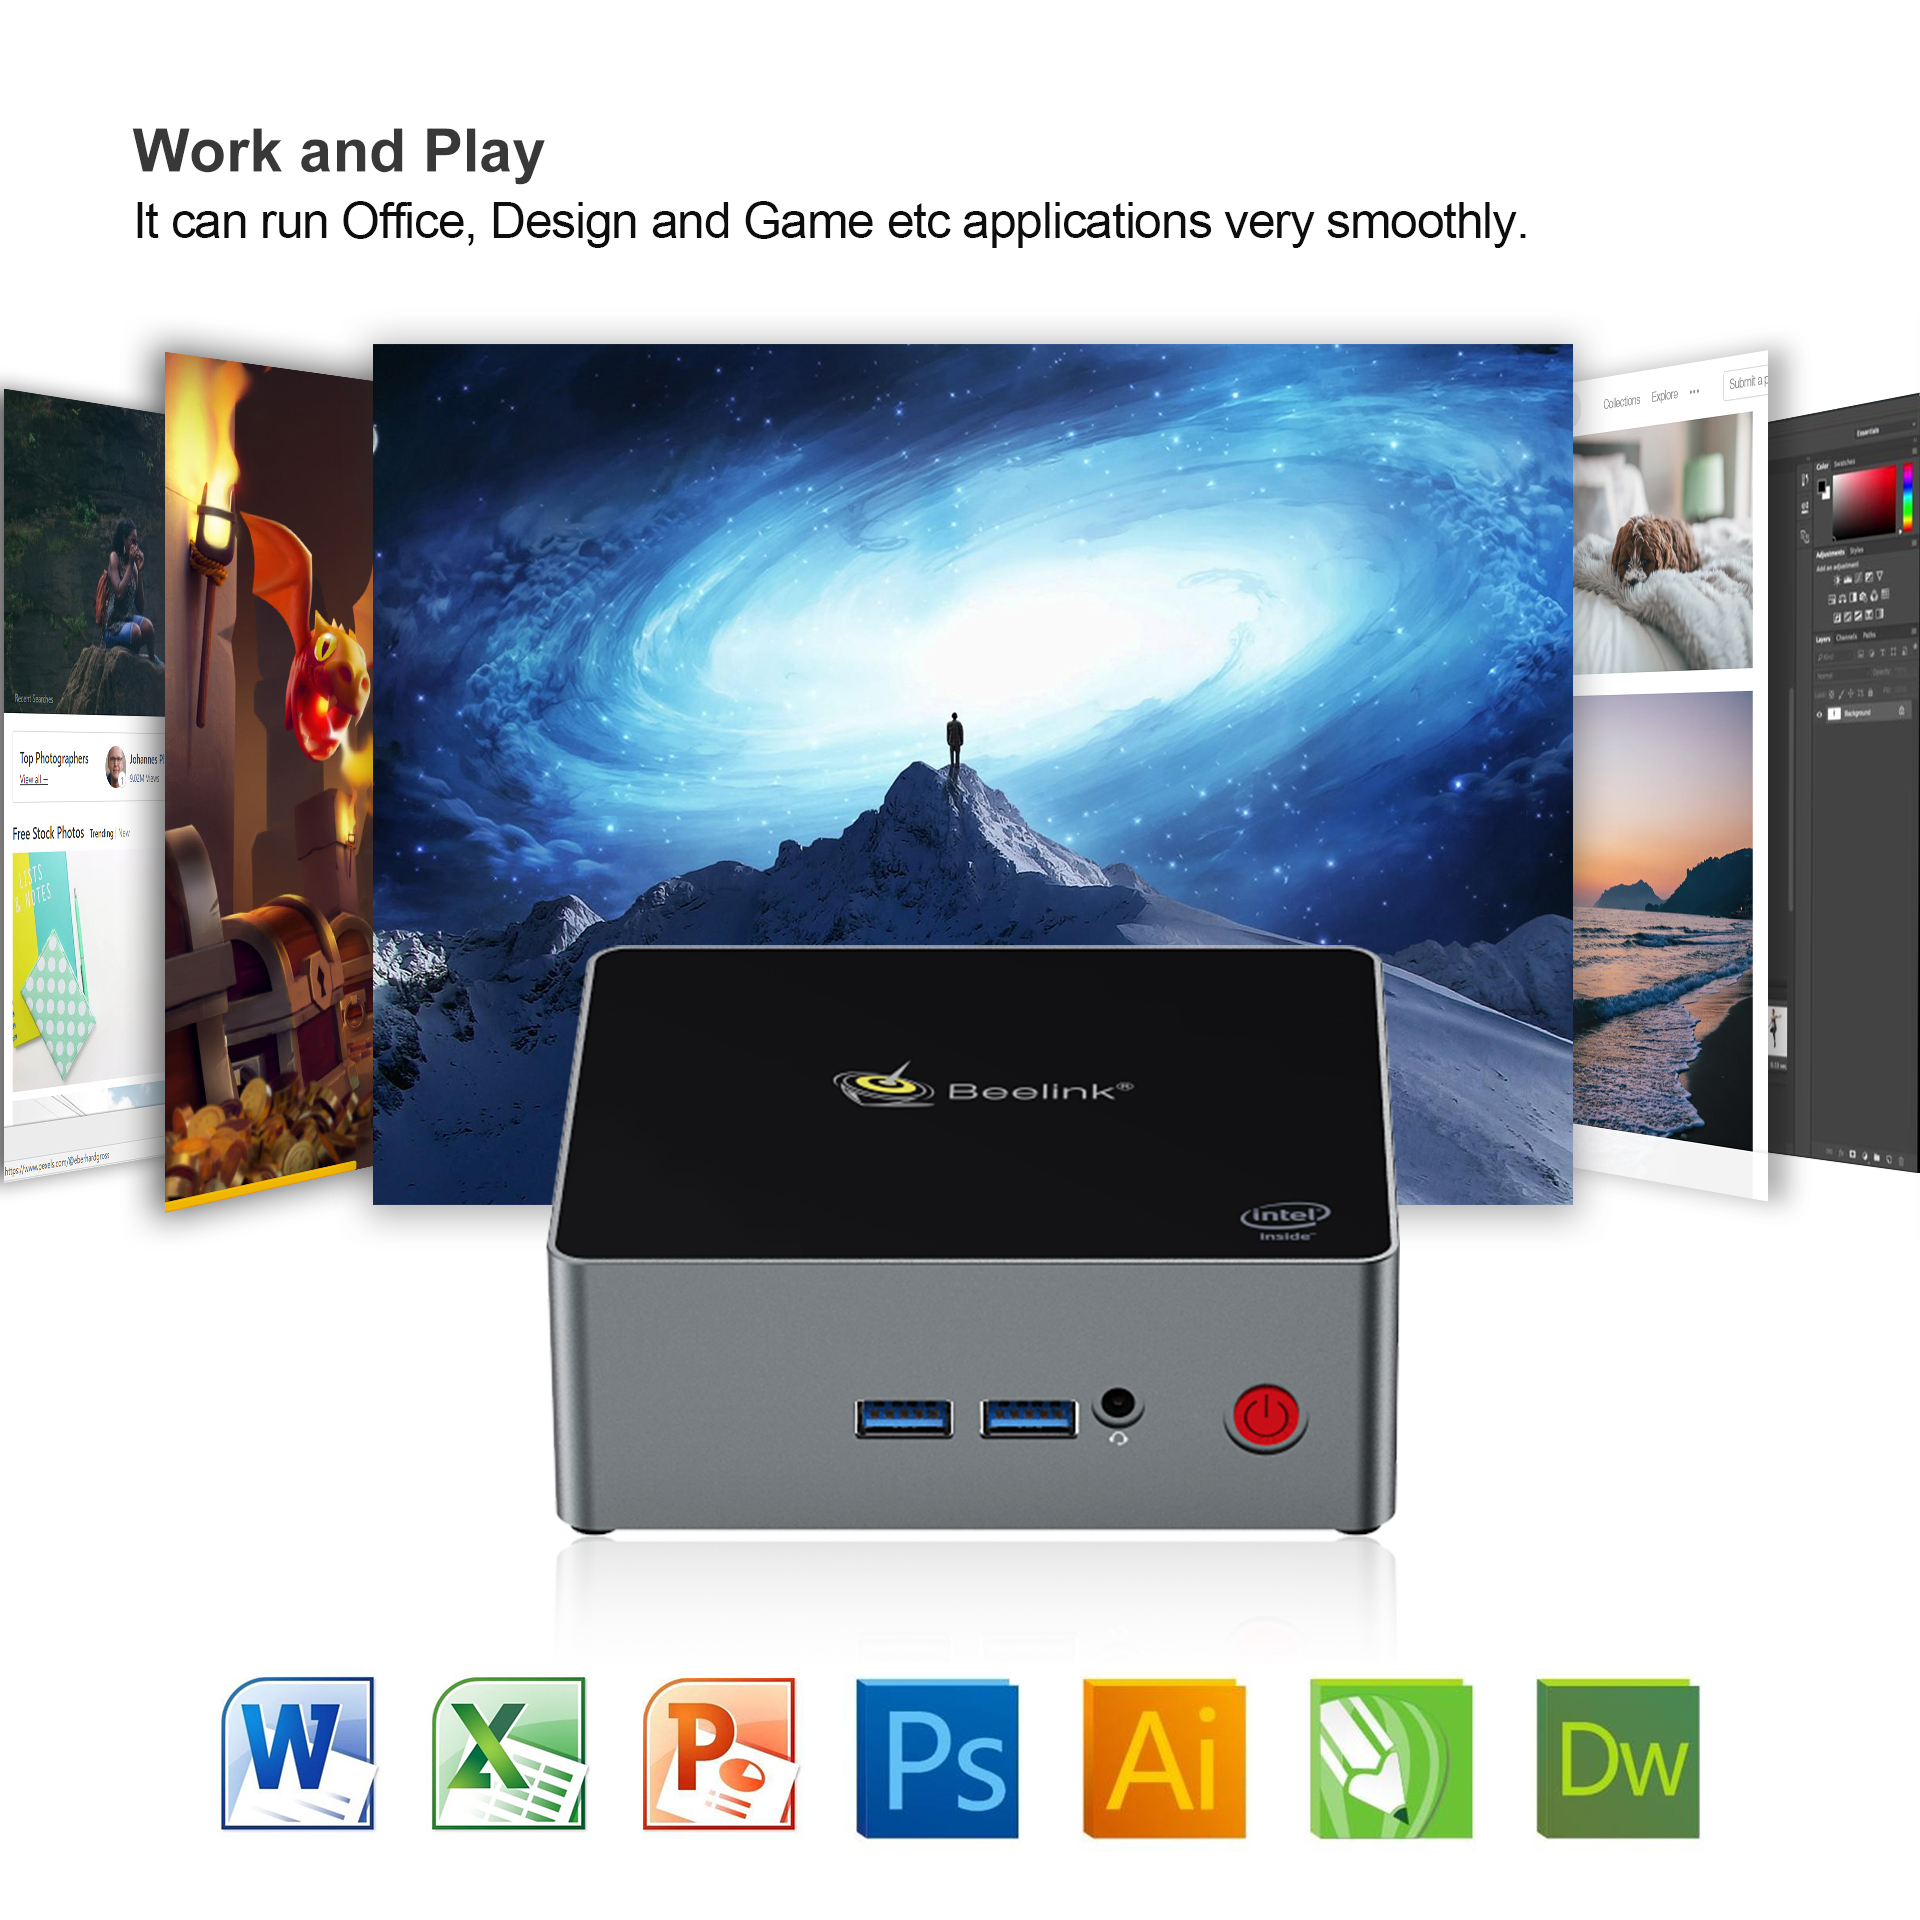 Beelink Latest J45 Powerful Mini Pc 4G/8G 128G/256G/512G J4205 1000M Dual Wifi Business Smart Mini PC Desktop